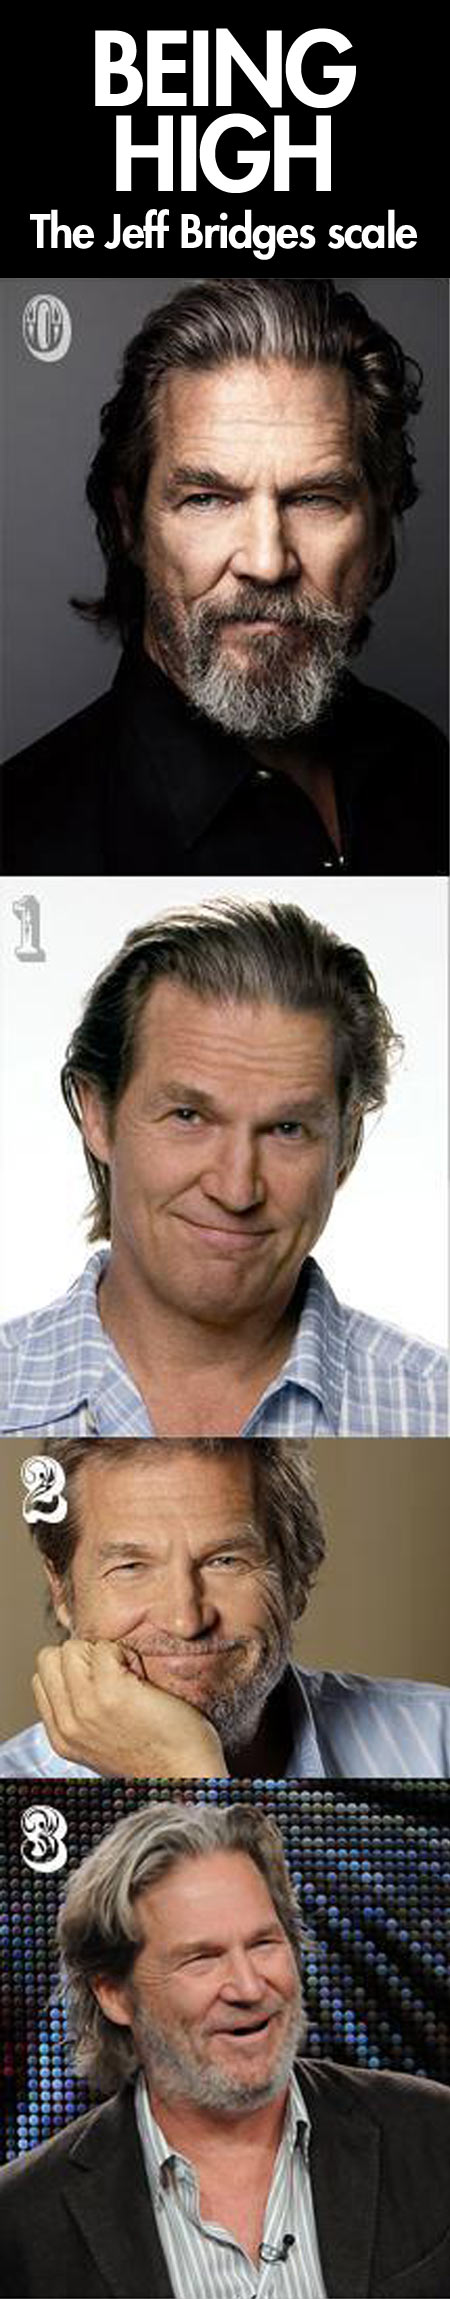 funny-Jeff-Bridges-scale-high